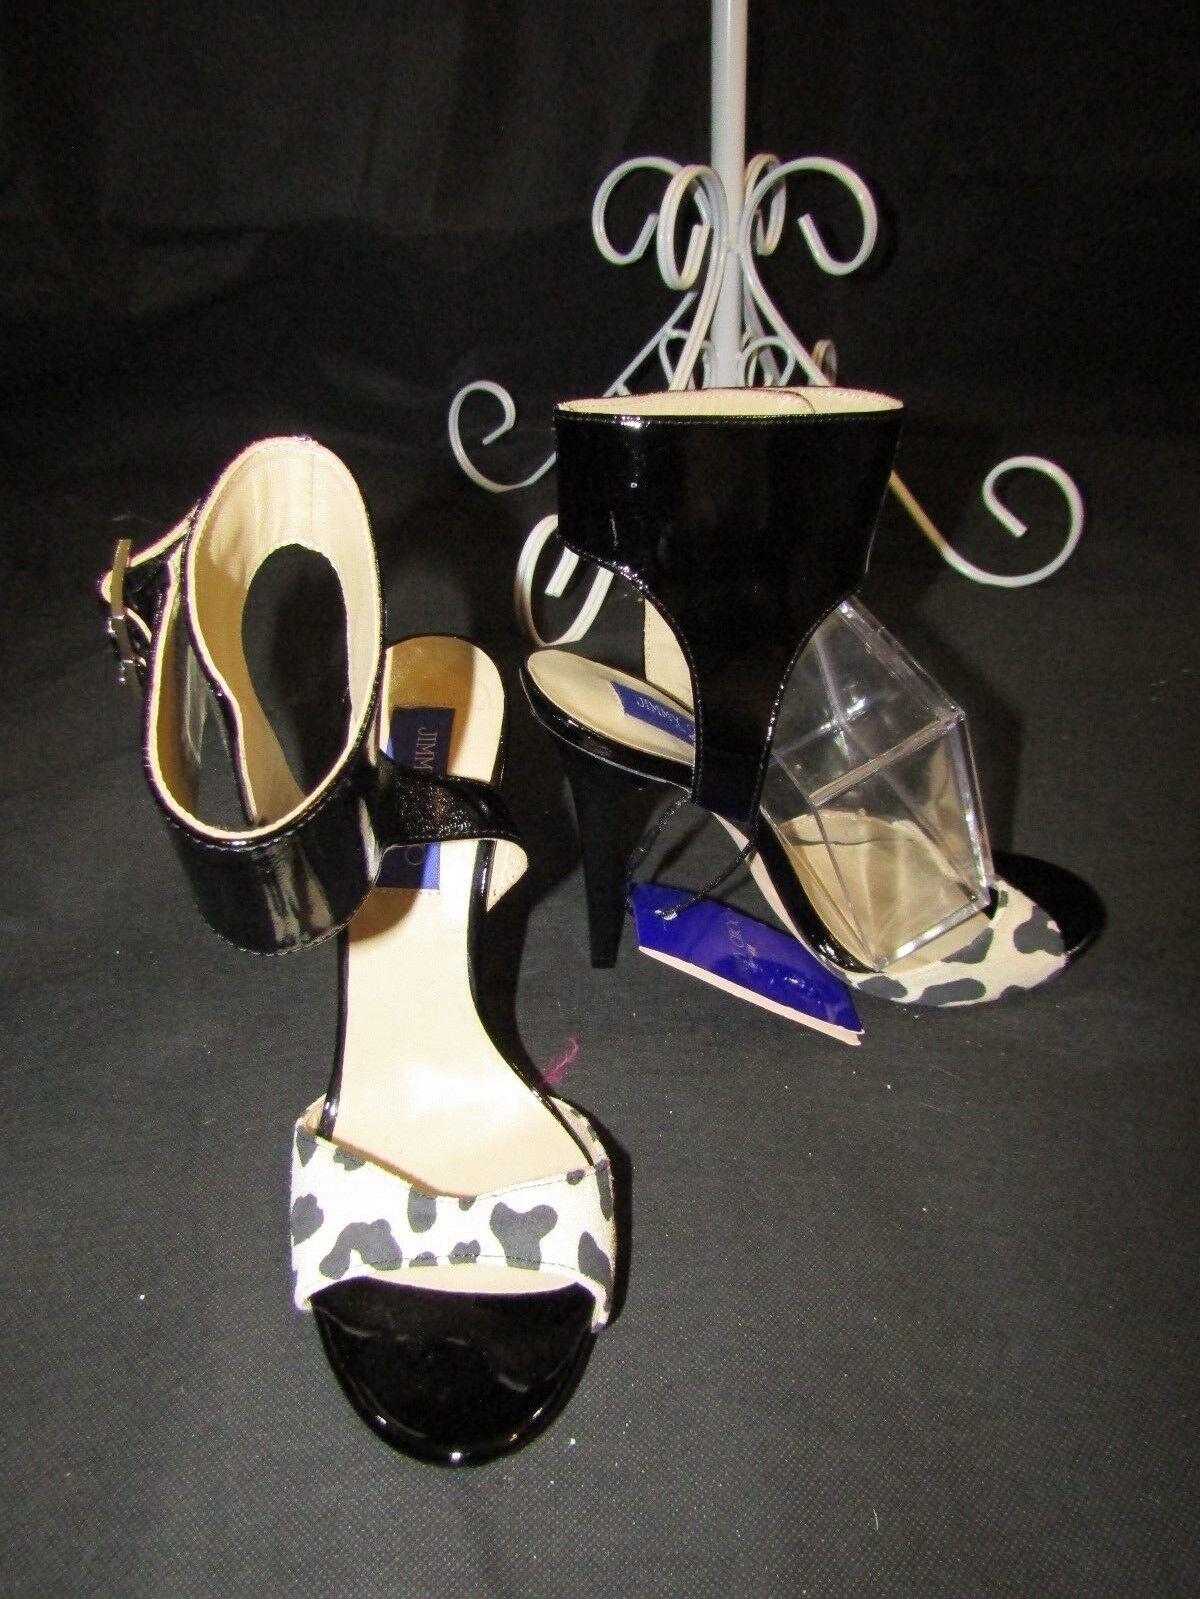 JIMMY CHOO FOR H&M Blk Patent Patent Blk & Suede Ankle Wrap Stiletto Sandal Heels Size 39 dc72d7